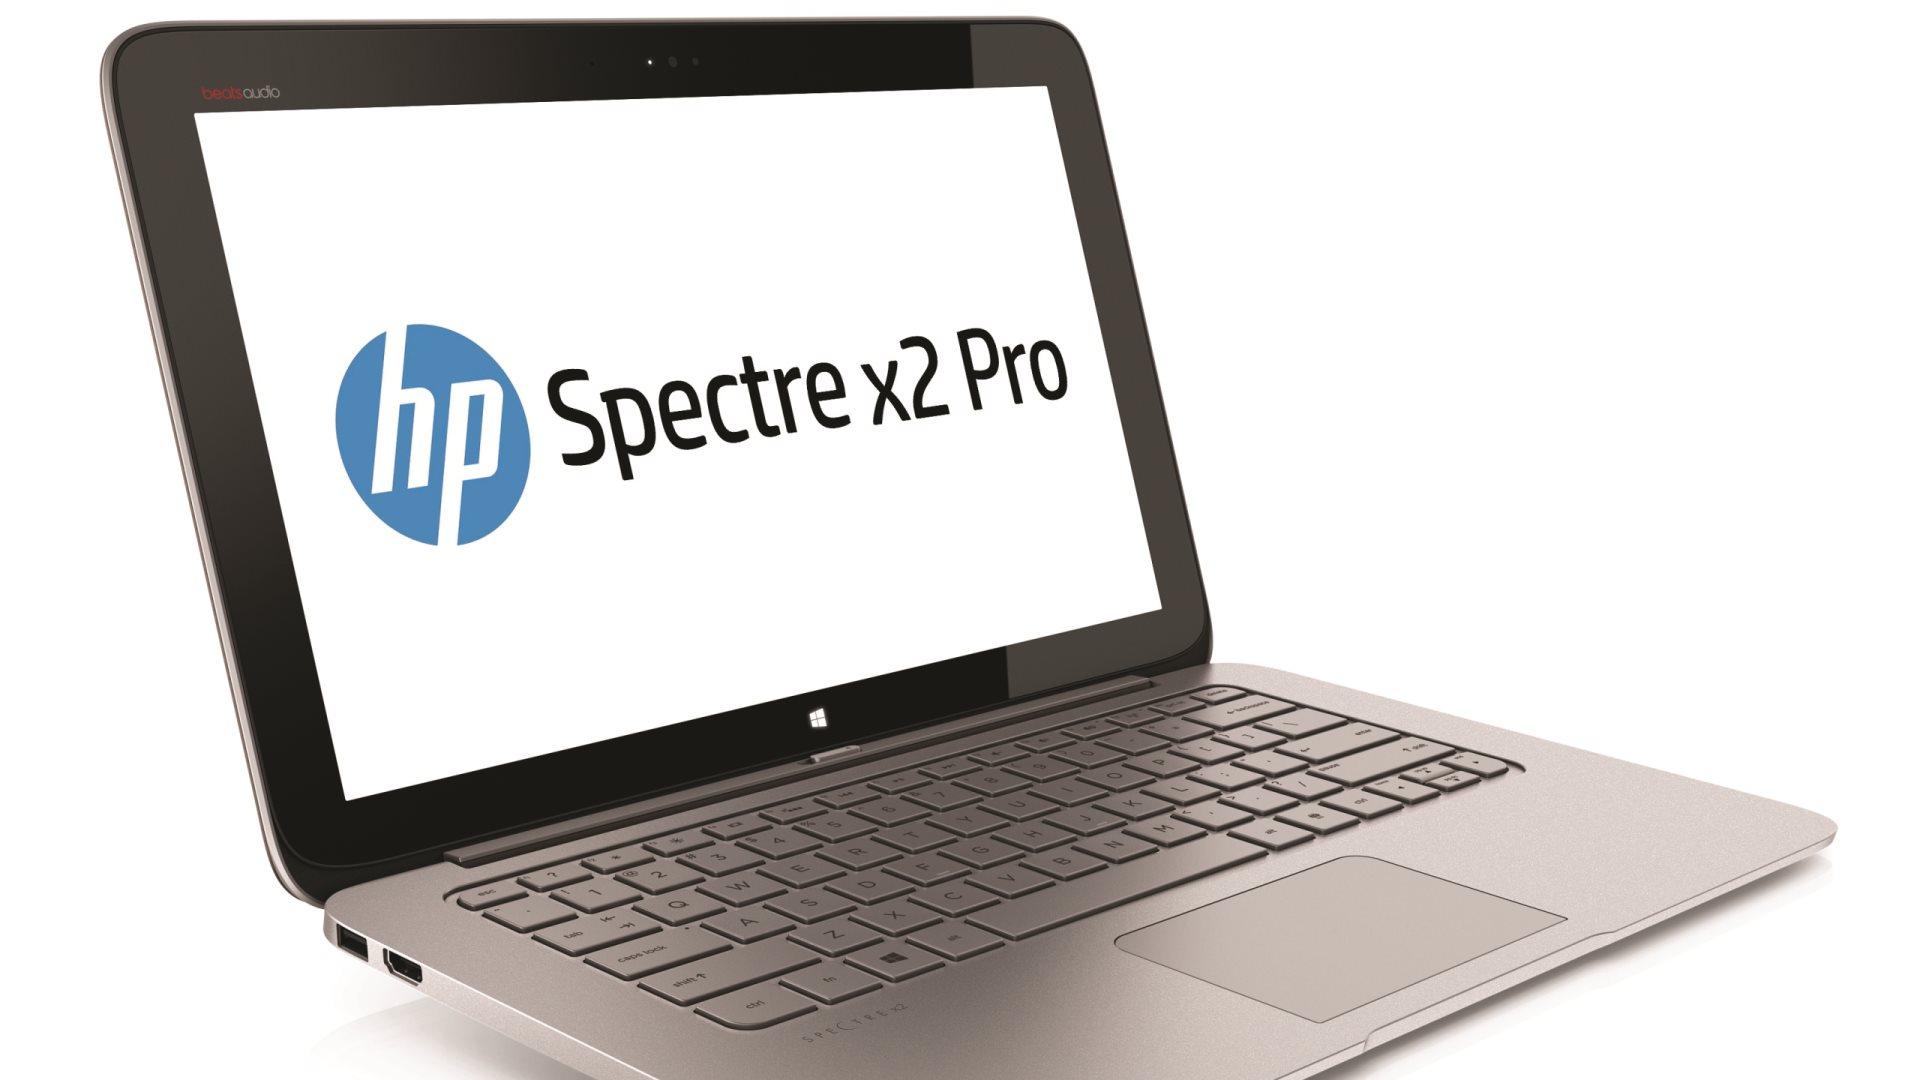 HP Spectre x2 Pro ultra HD 1920x1080